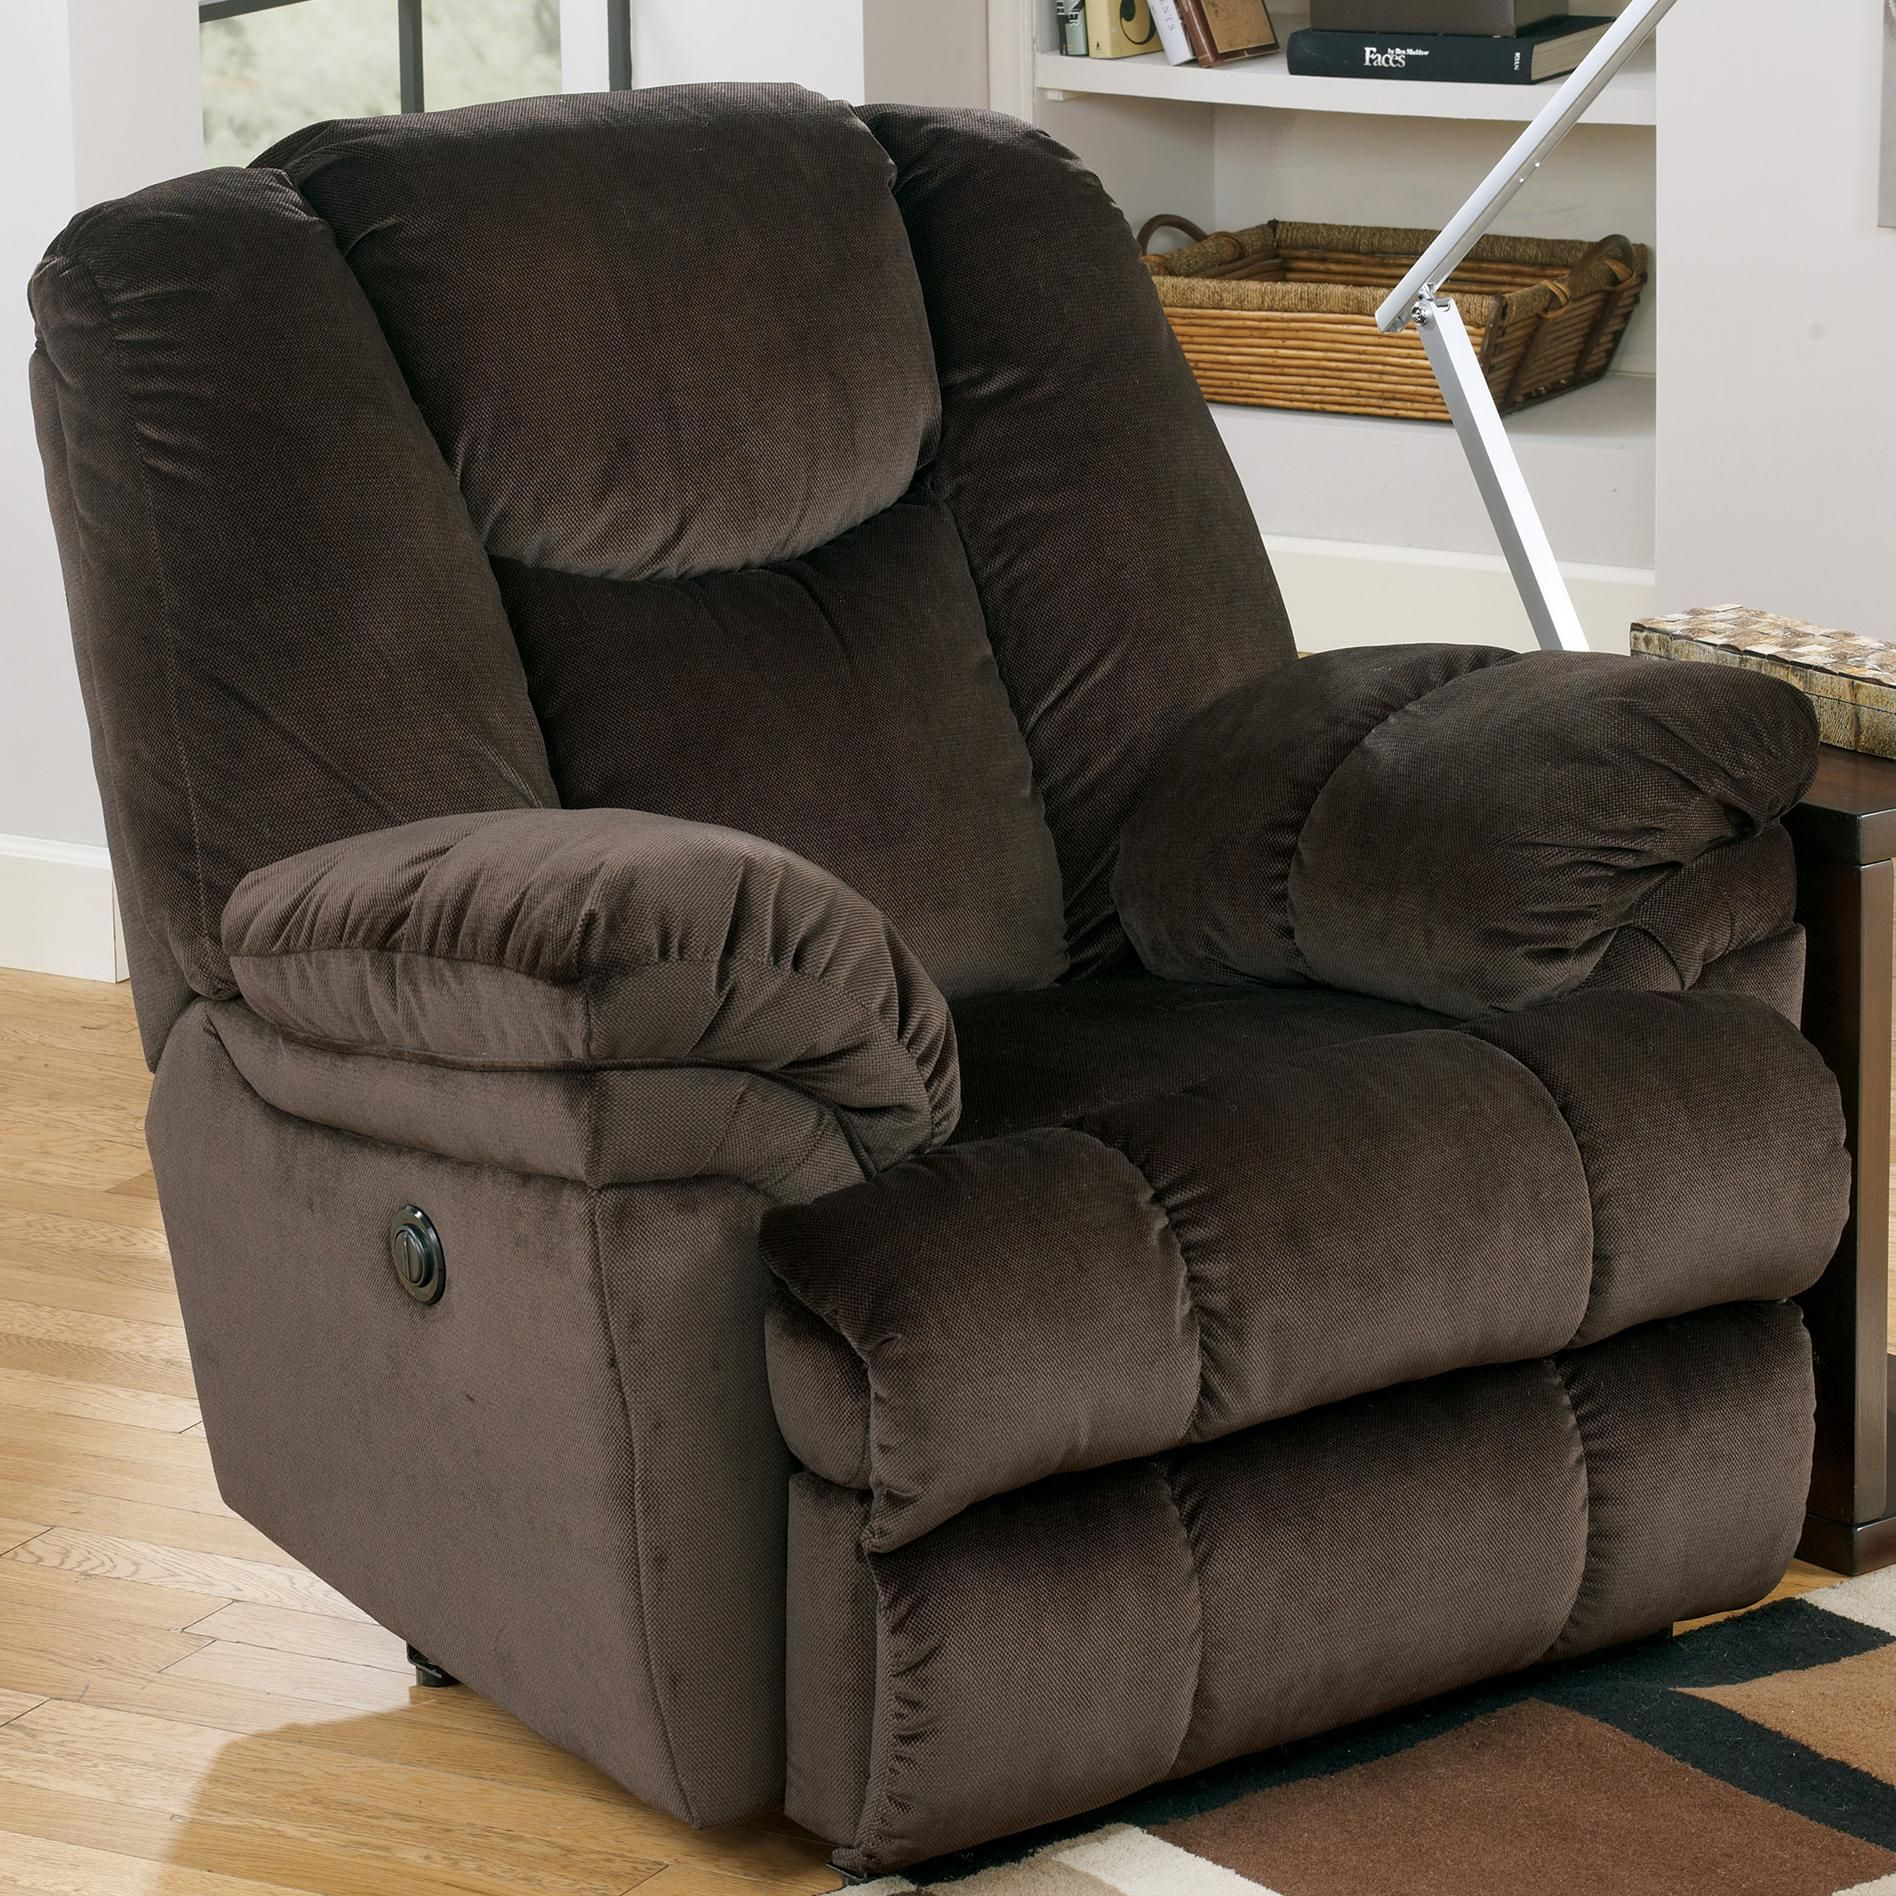 Swivel Chair Nebraska Furniture Mart Wooden Glider Outdoor Leoti Coffee Recliner By Signature Design Ashley